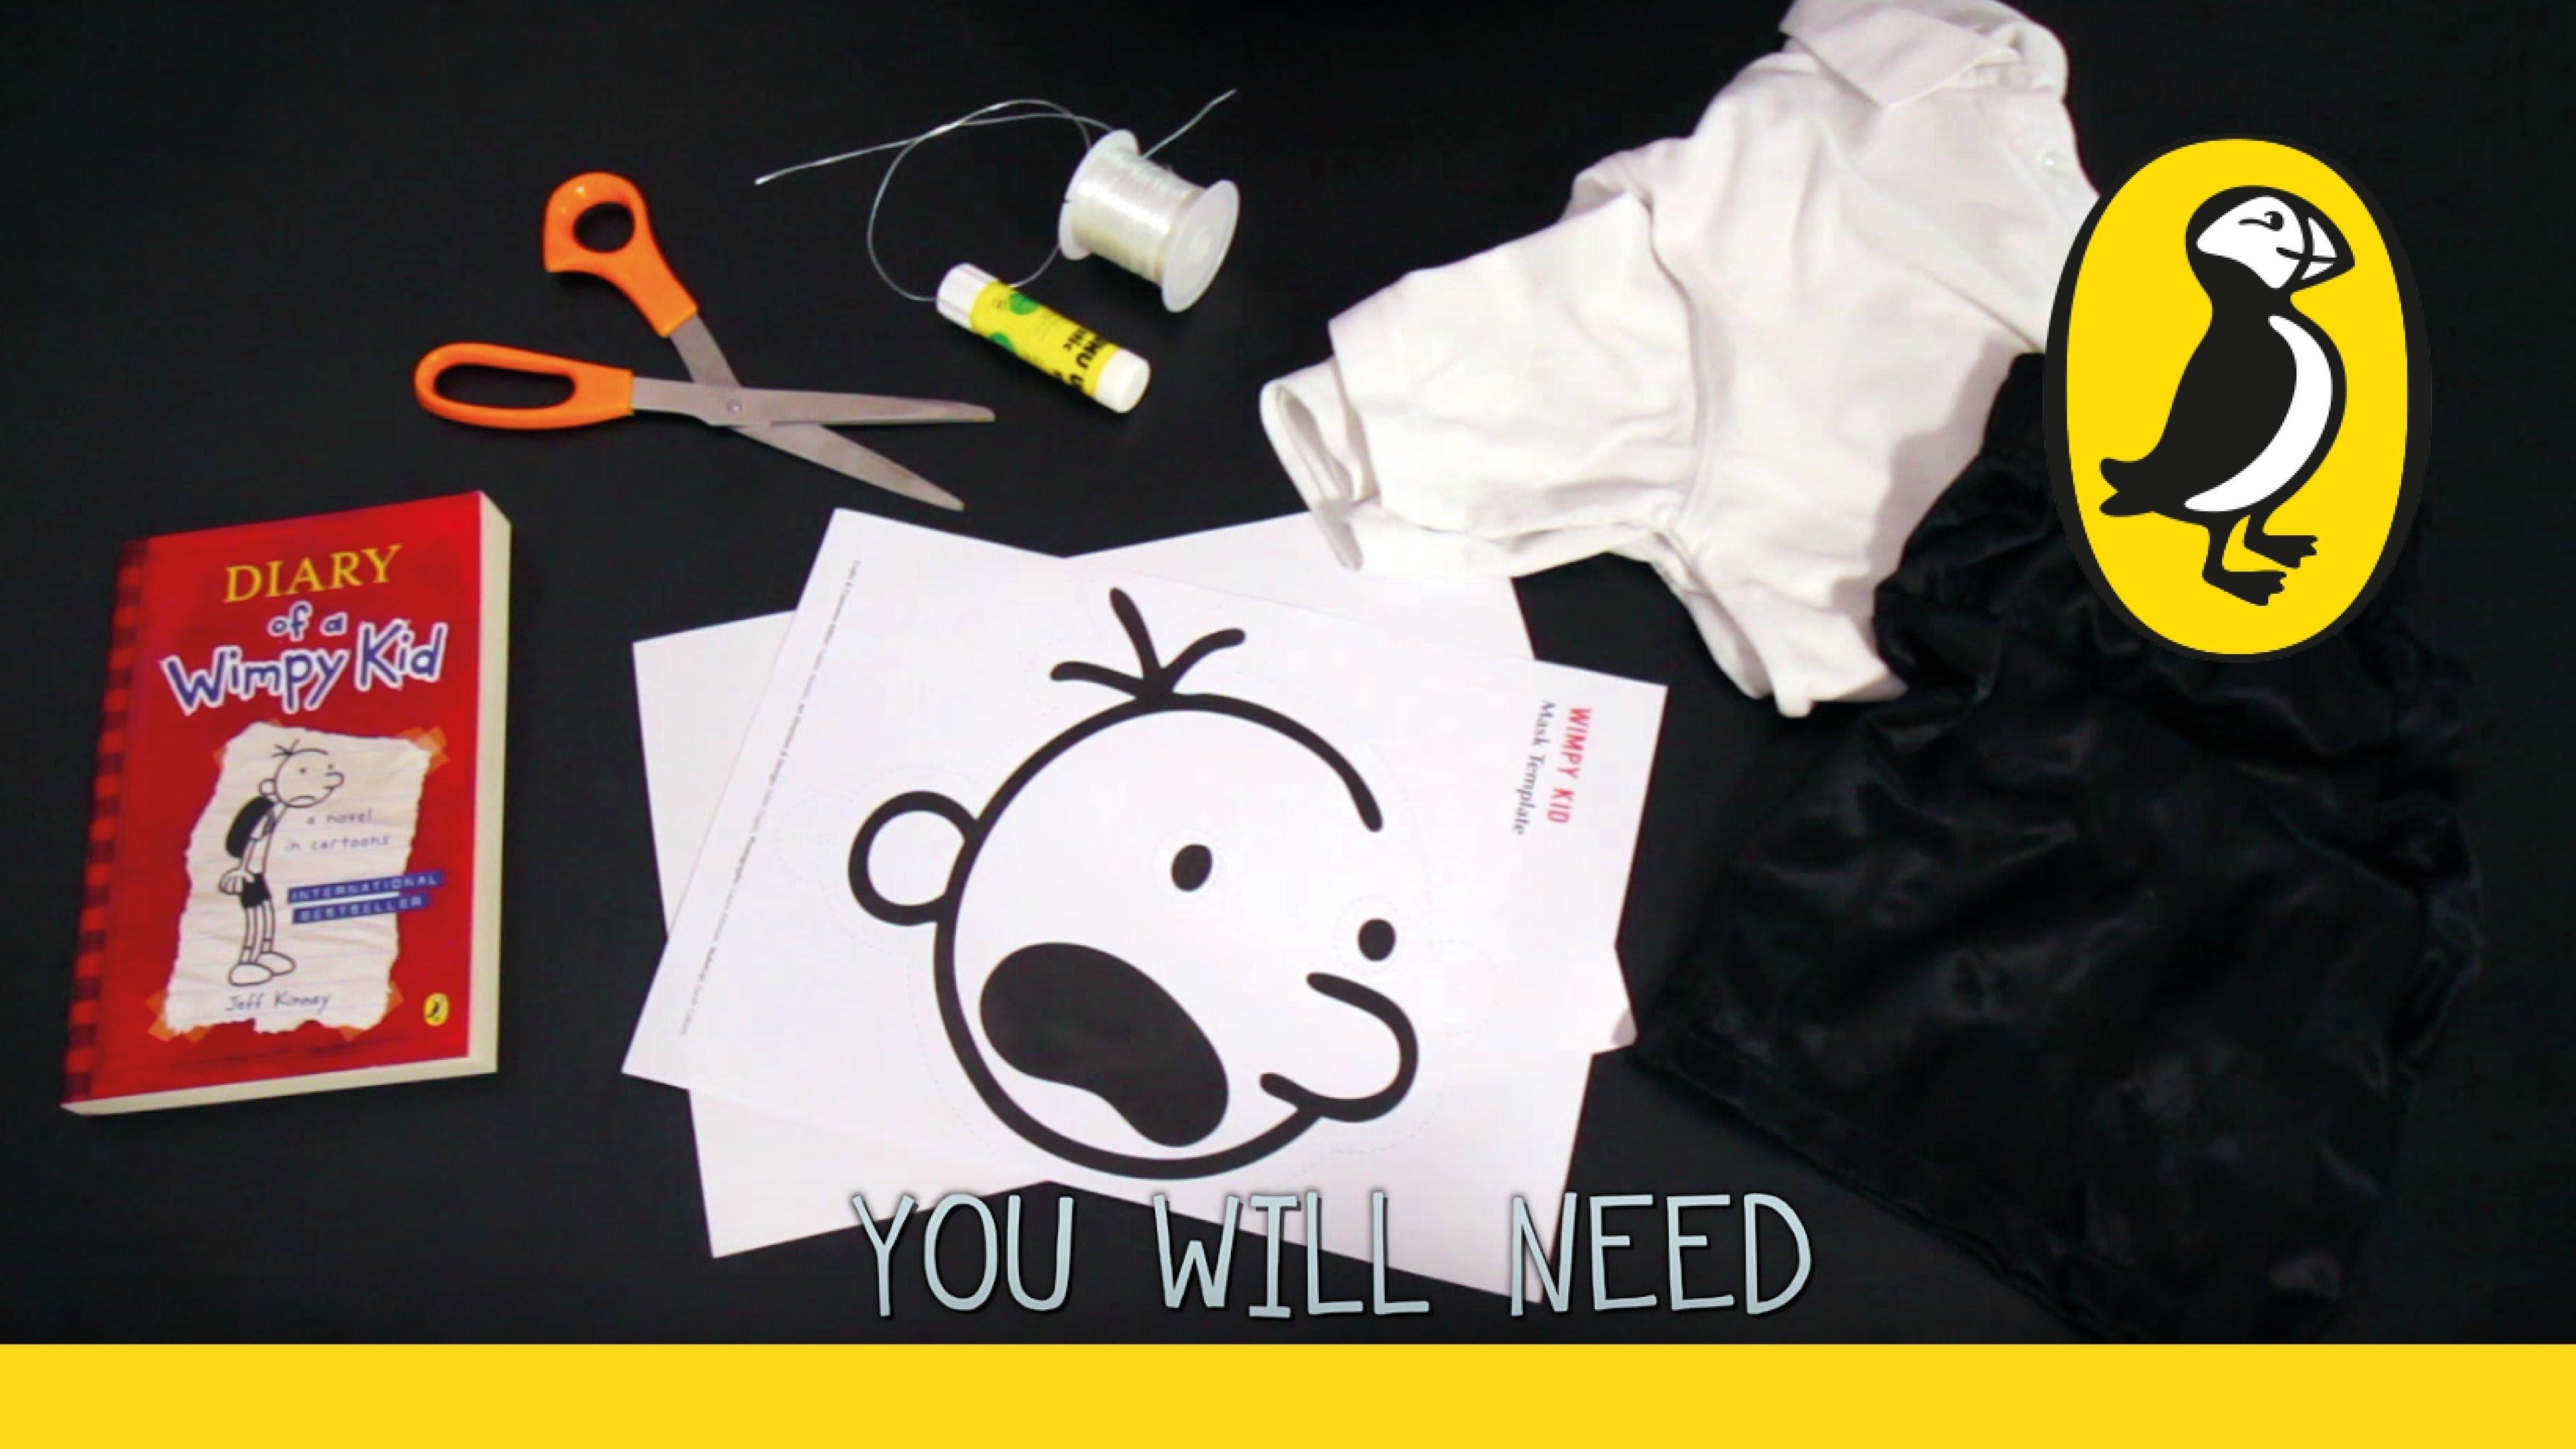 10 Gorgeous Diary Of A Wimpy Kid Costume Ideas dress up as greg heffley diary of a wimpy kid costume idea 2020